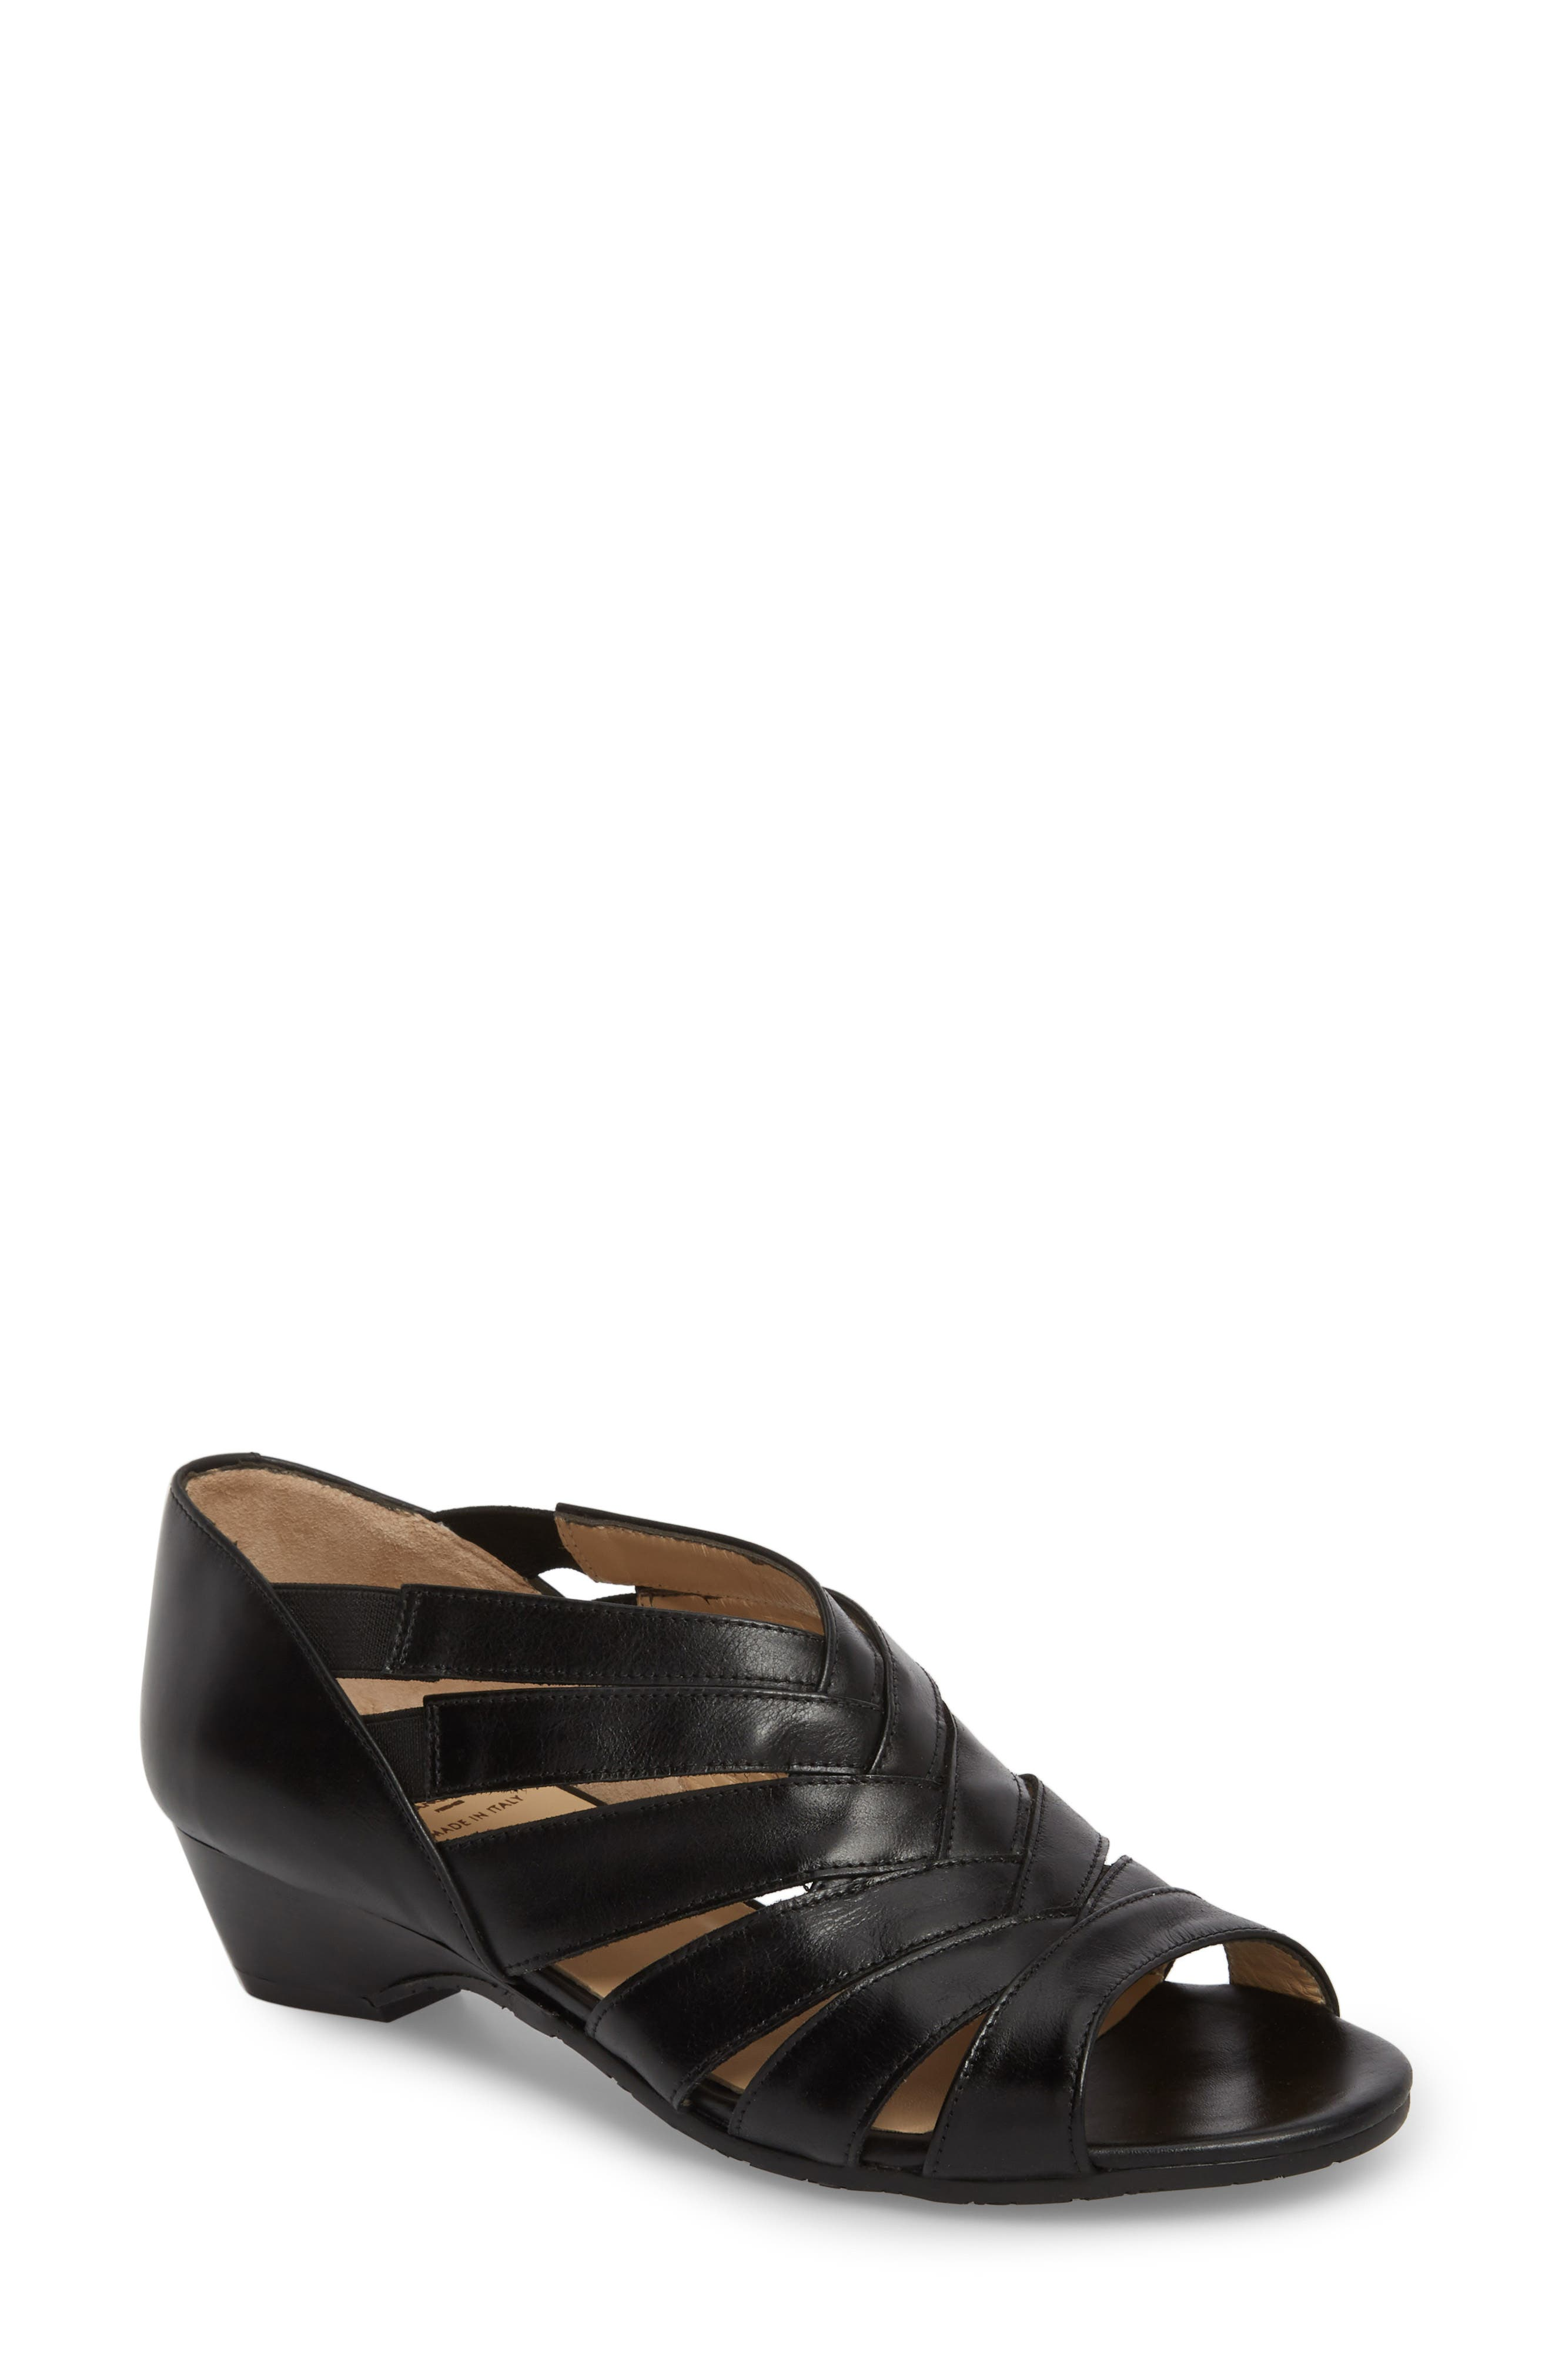 Demetra Sandal,                             Main thumbnail 1, color,                             Black Leather